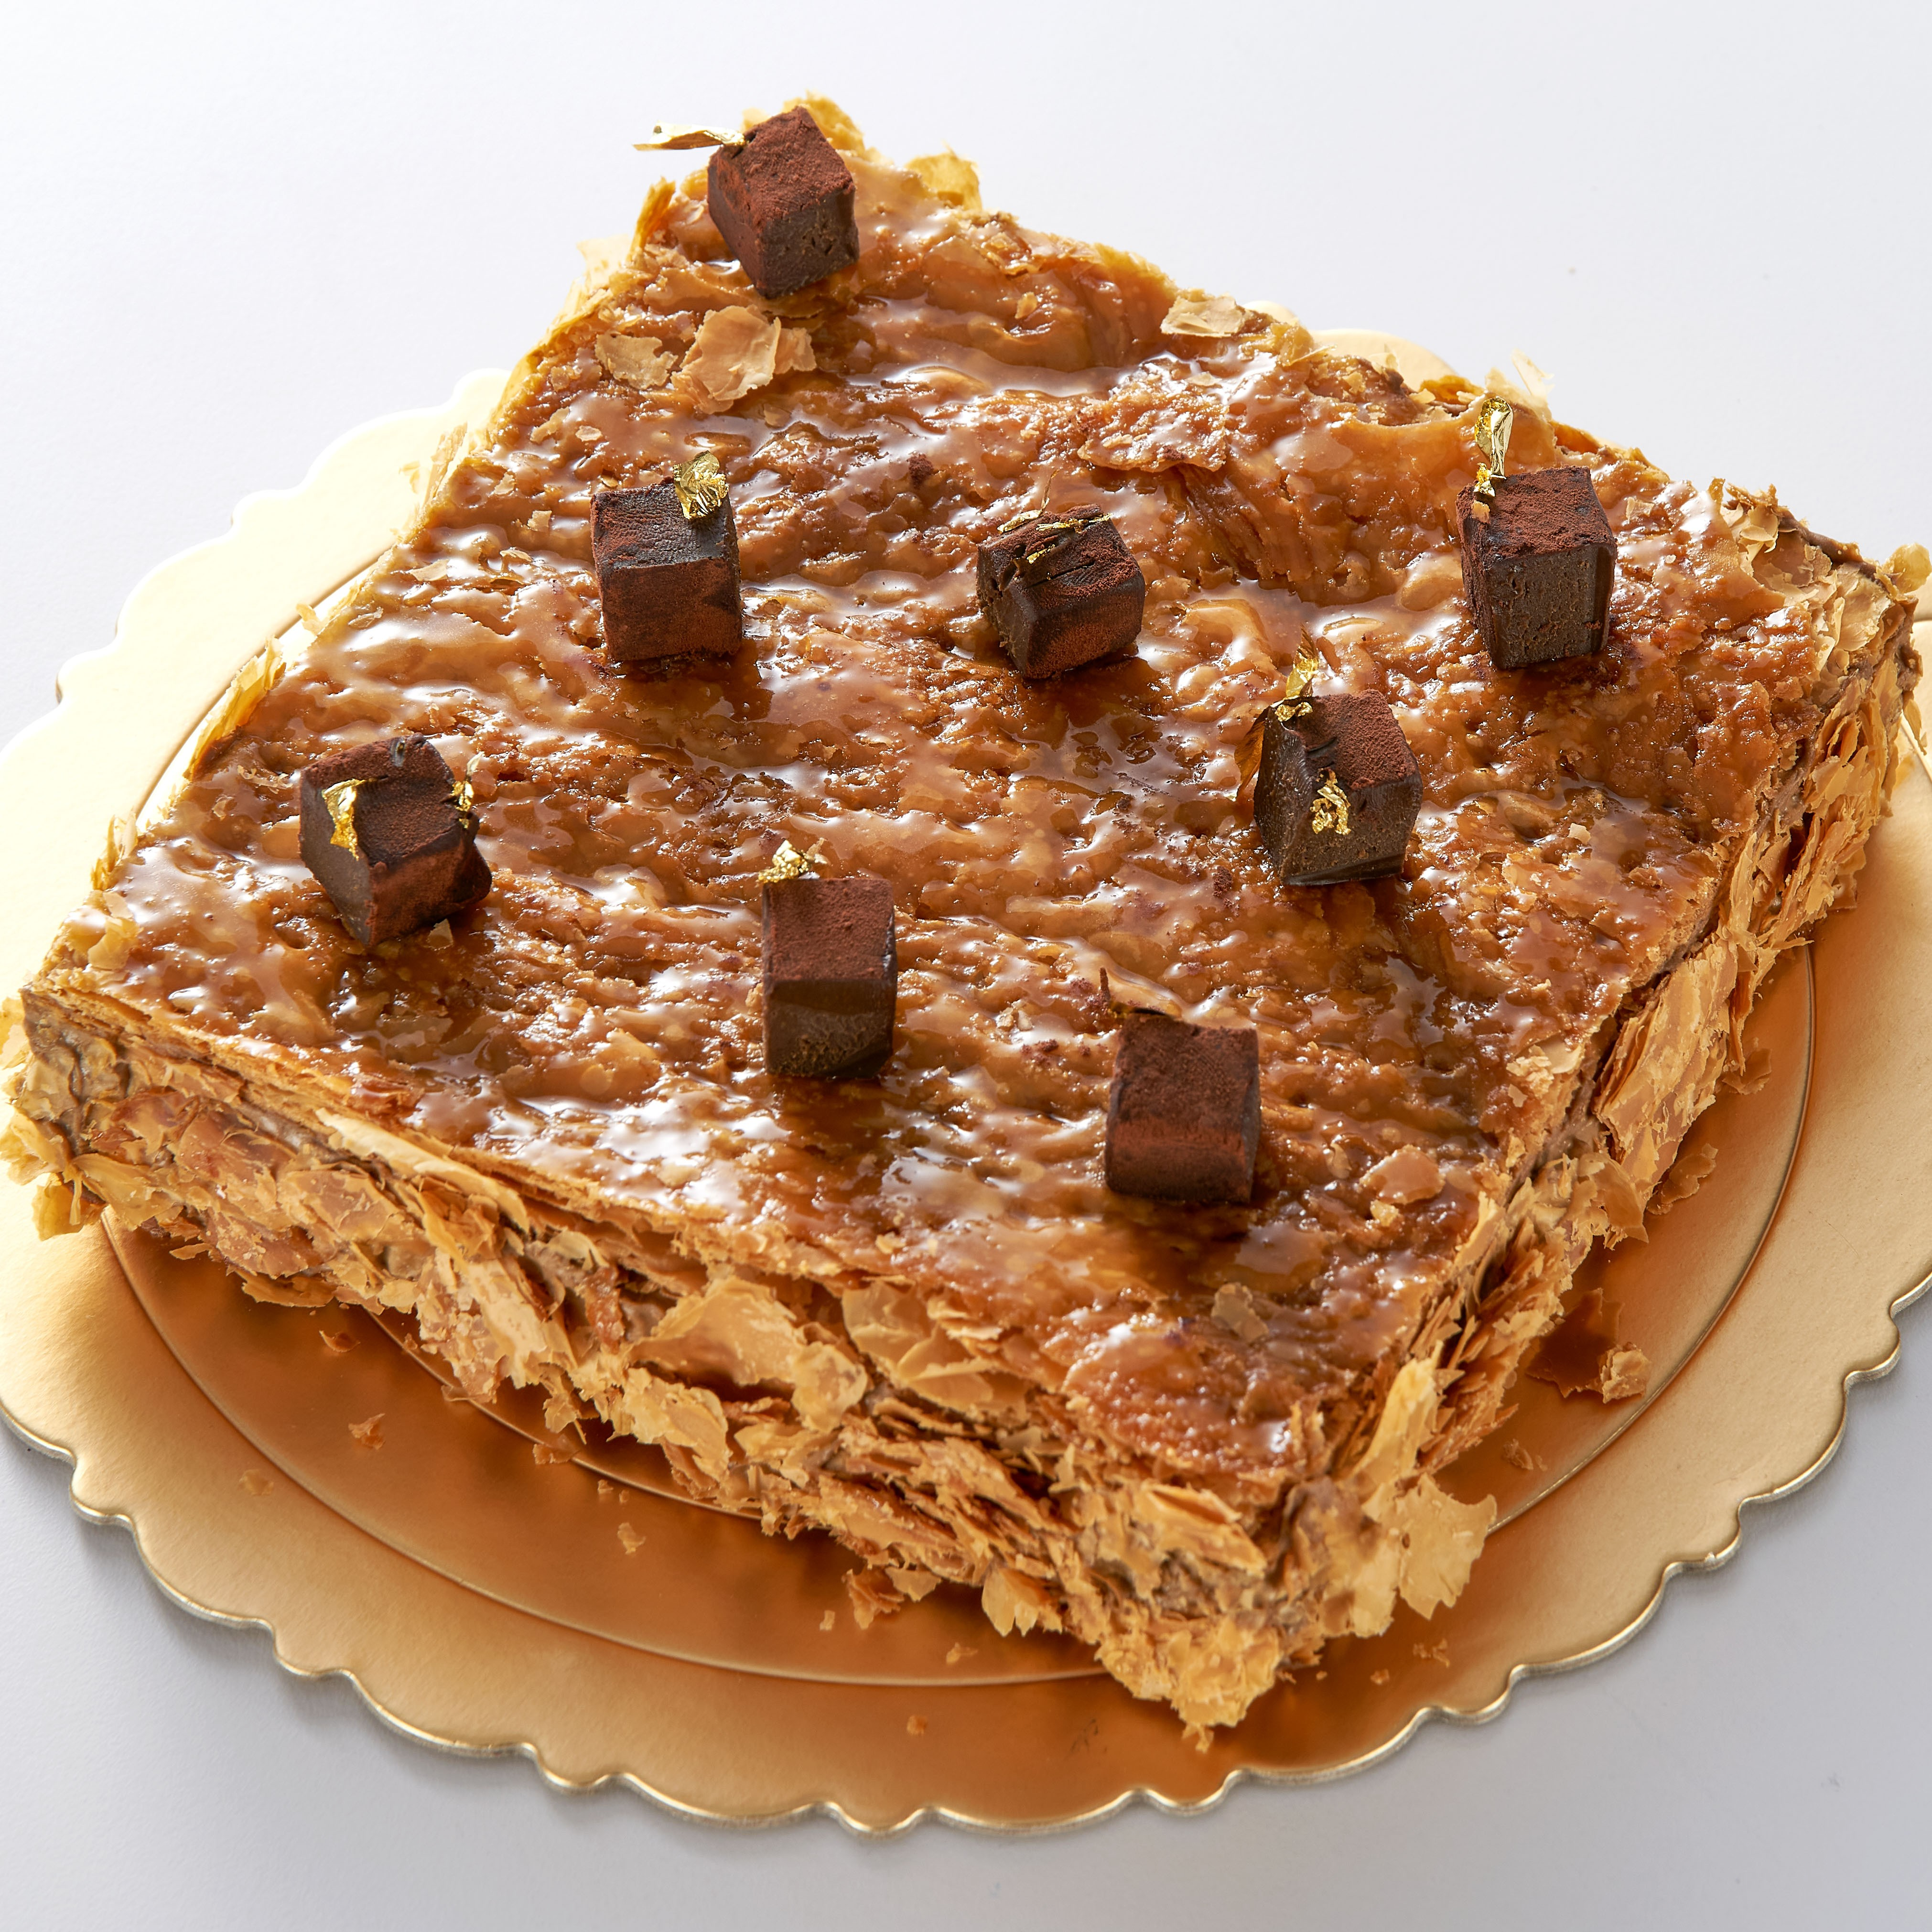 TDH貓茶町-鐵觀音之吻生日蛋糕 8吋(限門市取貨)